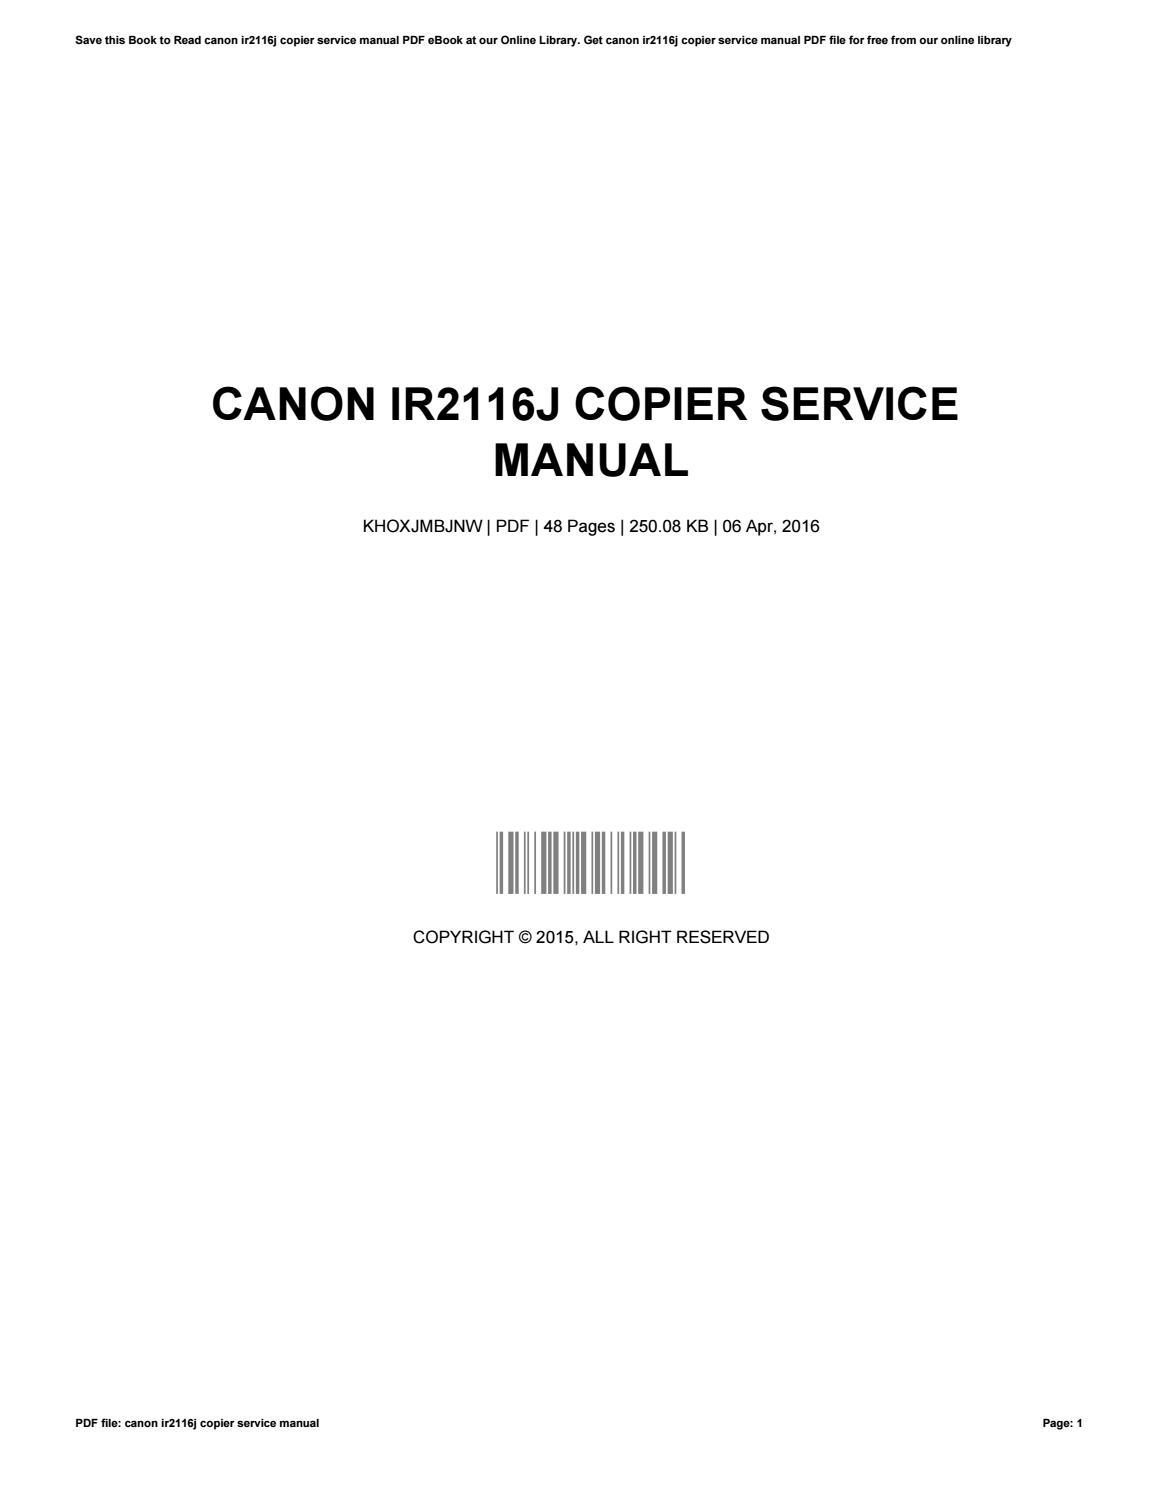 Dell Sp2309w Manual Ebook Yale Glc080 Wiring Diagram Array Canon Ir2116j Copier Drivers For Windows Download Rh Neuhold Website